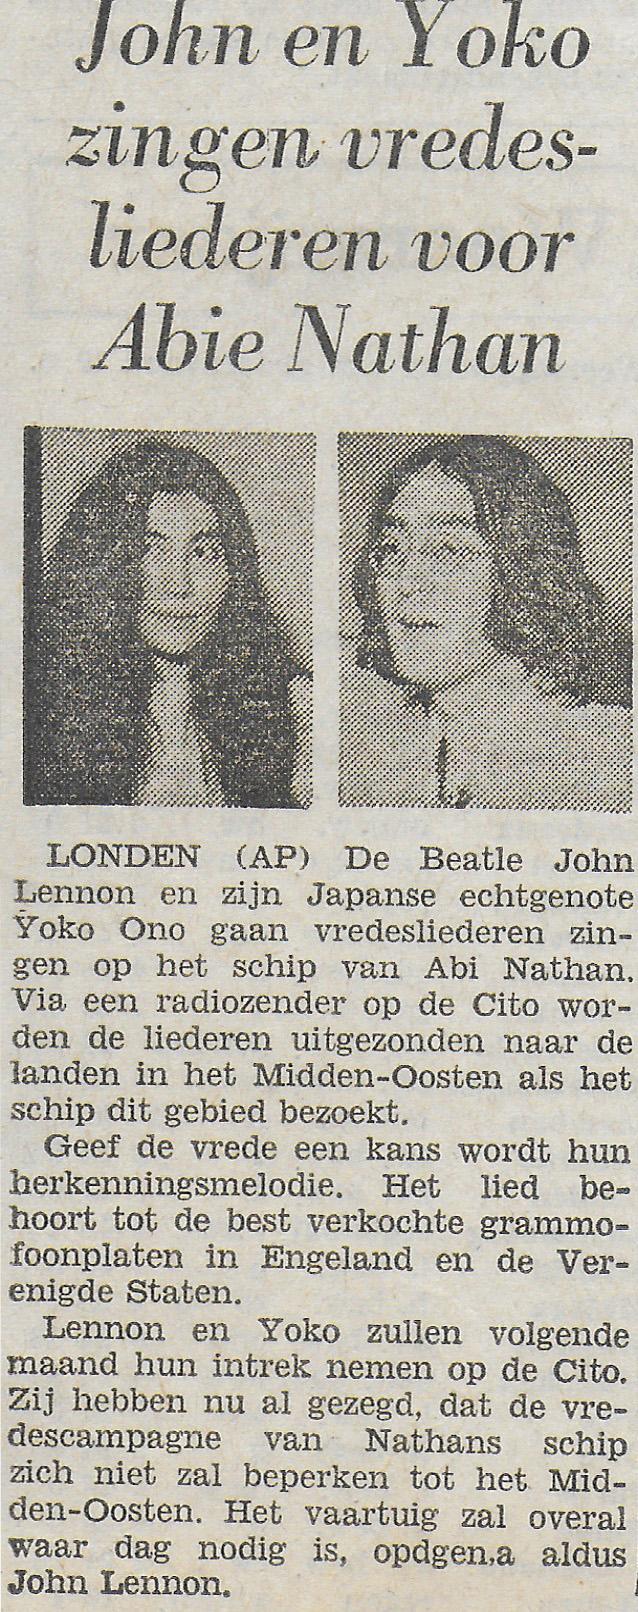 1969 VOP John en Yoko.jpg